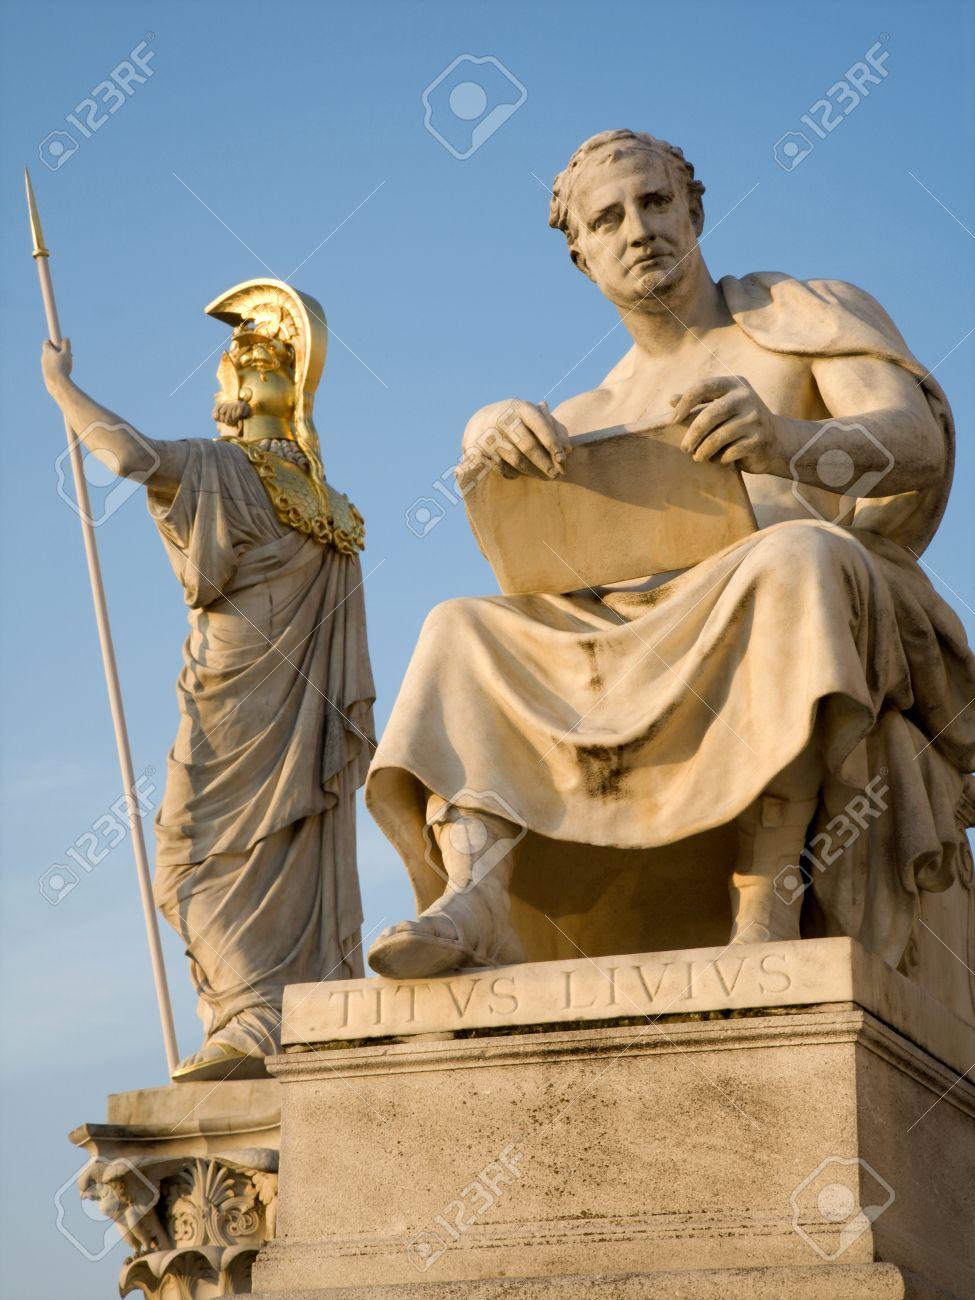 Vienna - Titus livius statue and Athena funtain Stock Photo - 11798067